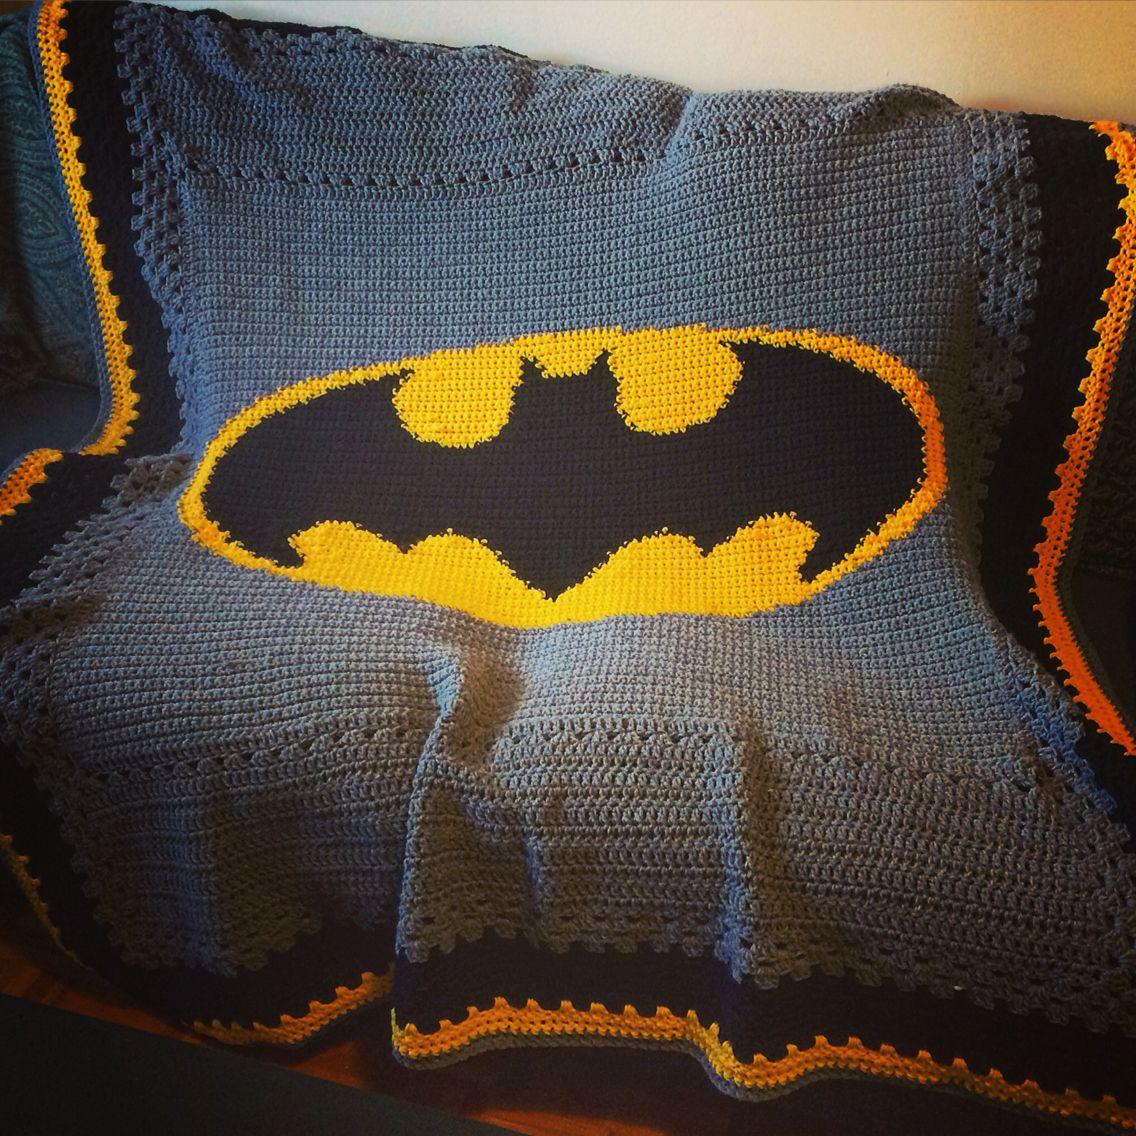 Na Na Na Na Na Na Na Na Blanket Crochet Batman Sewing